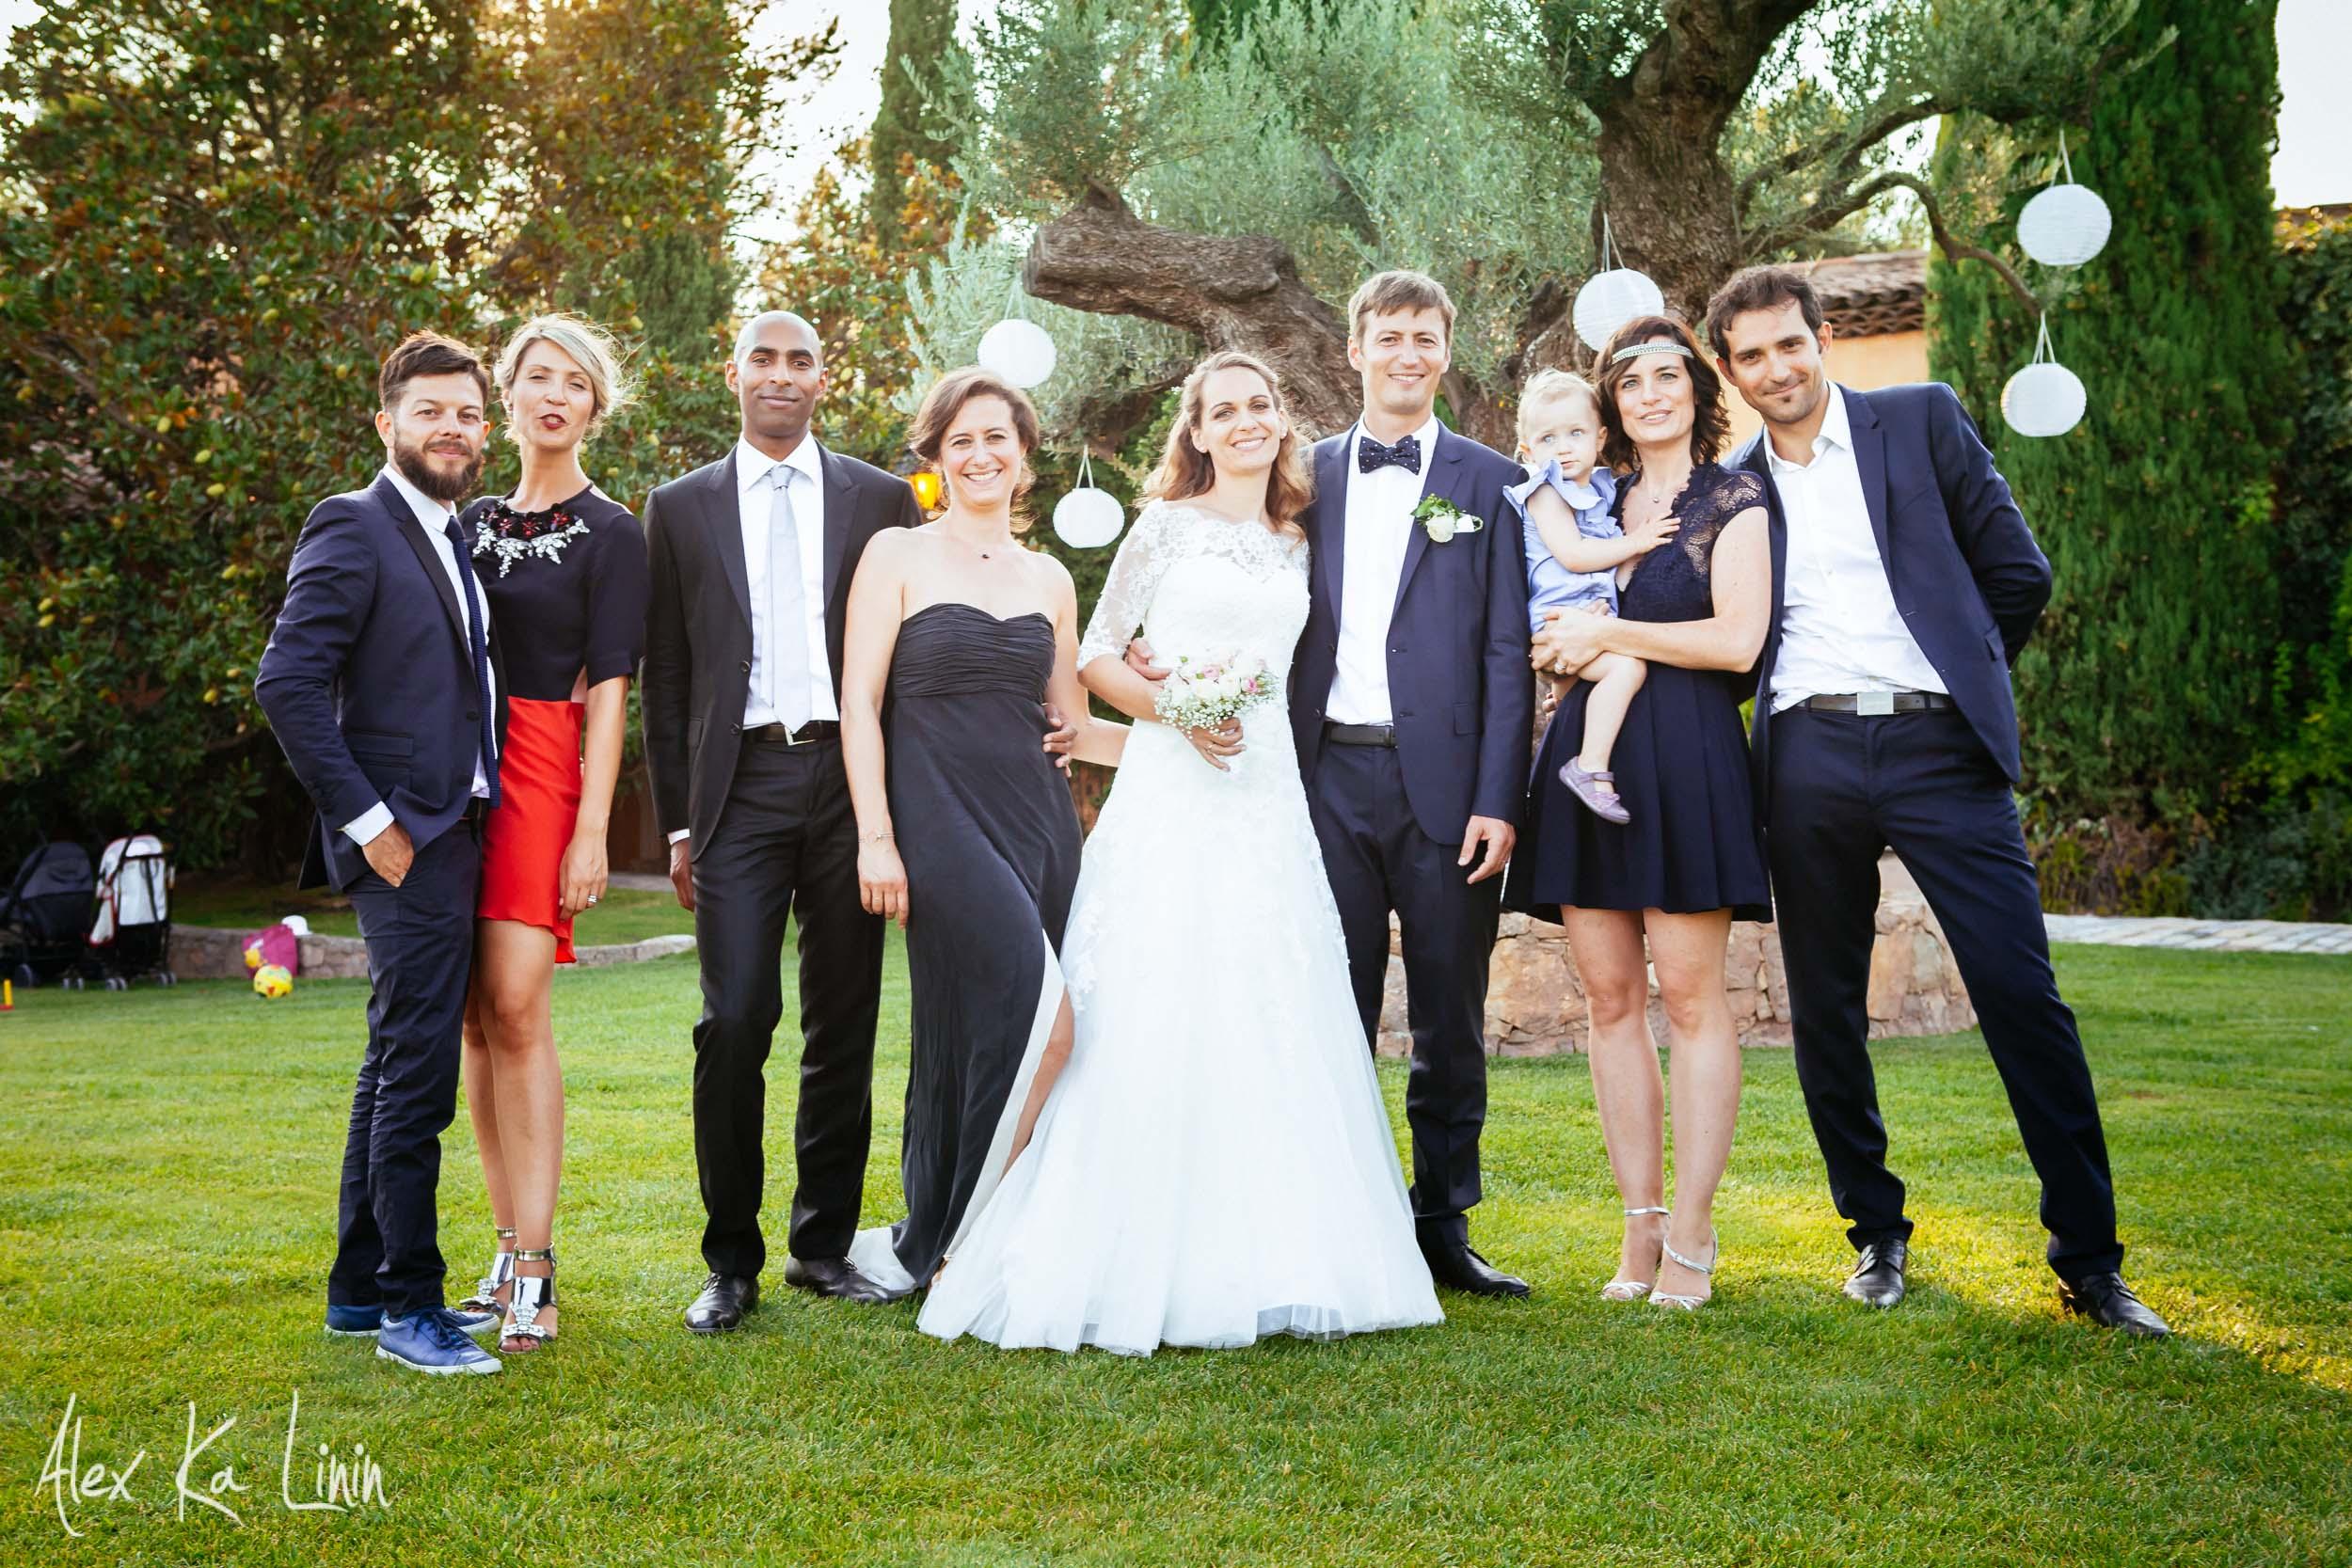 AlexKa_wedding_mariage_photographer-43.jpg